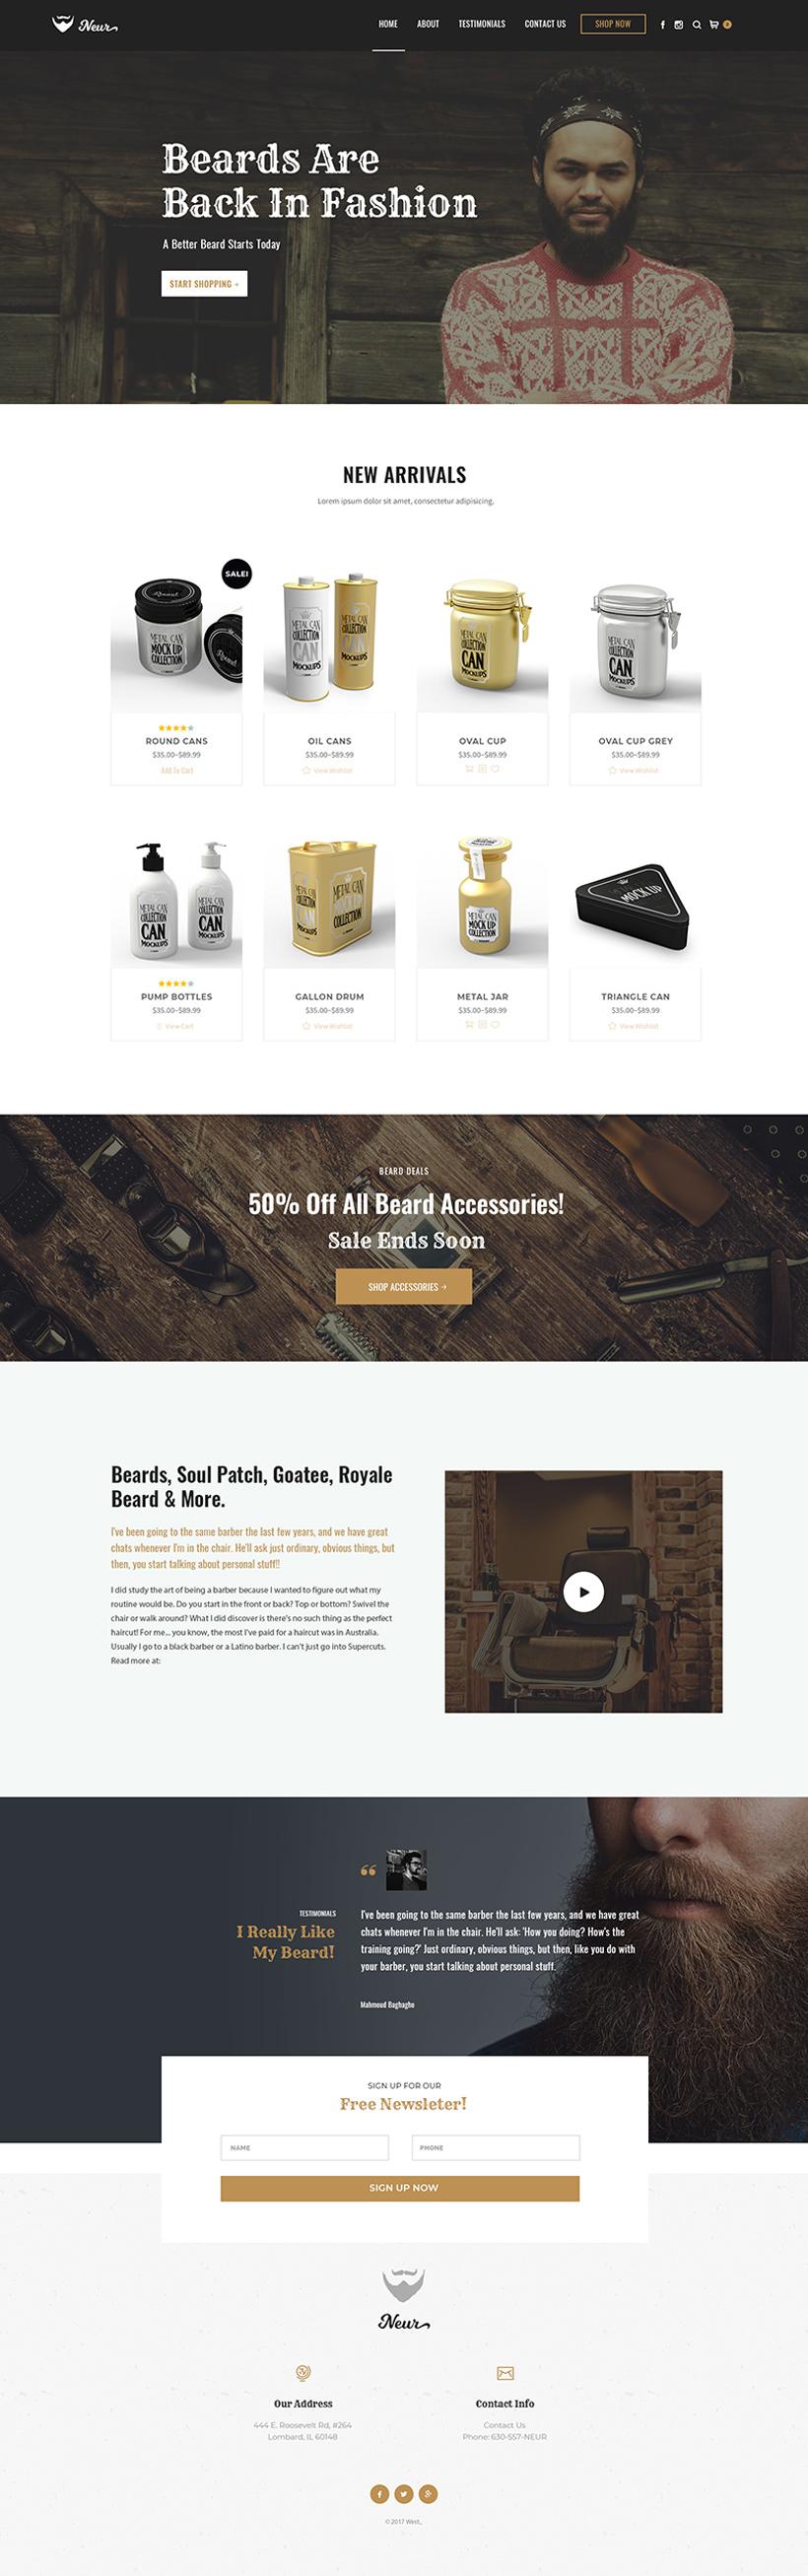 Beard Oil WordPress Website Design Mockup